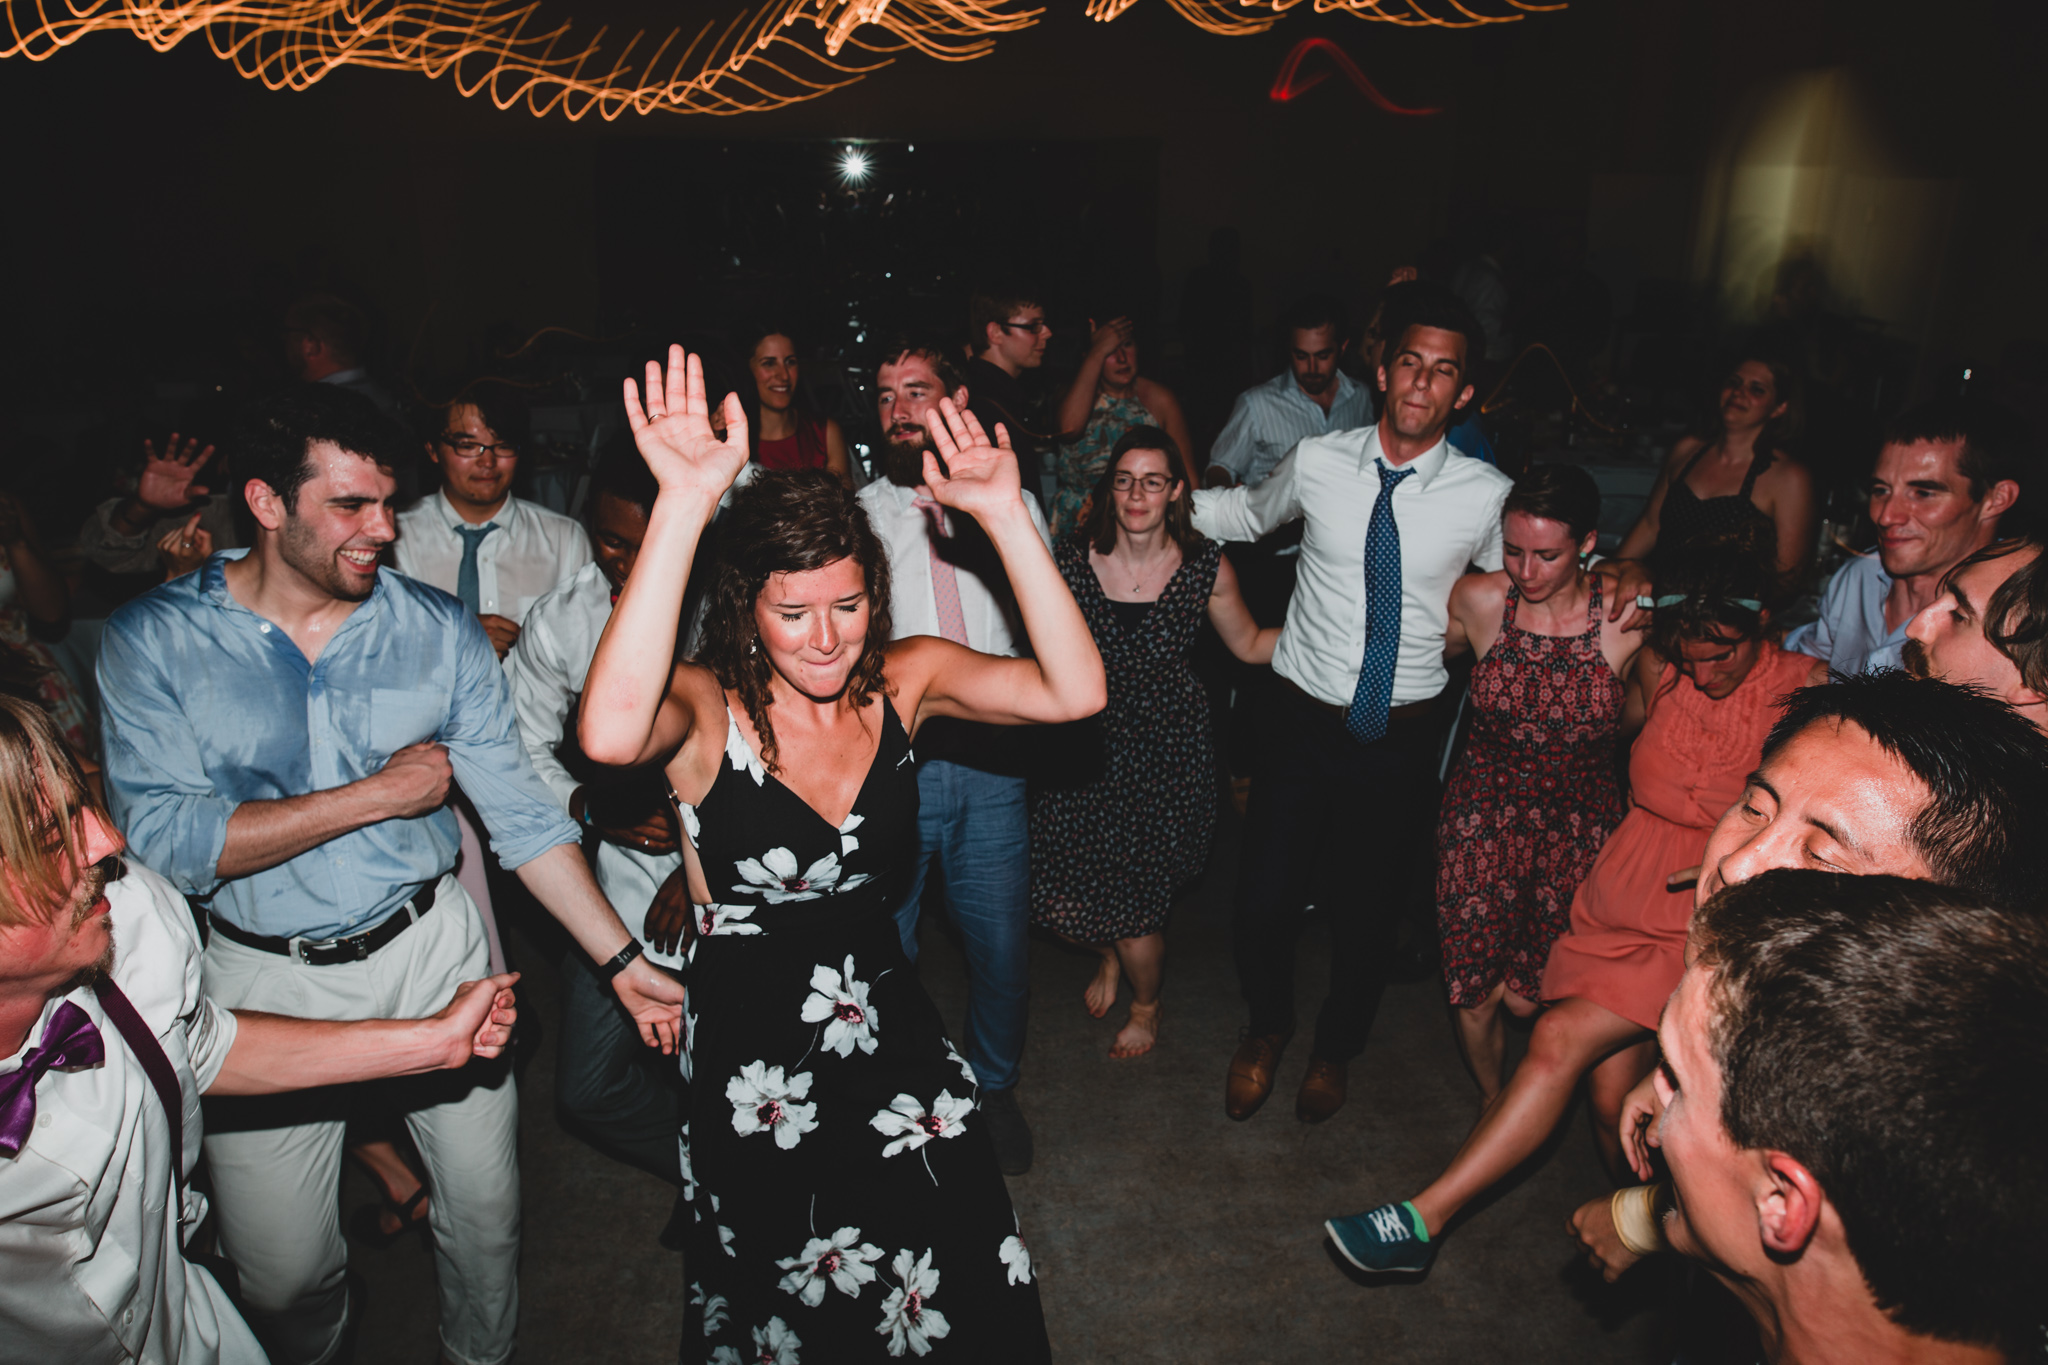 Creative alternative wedding photos in Ottawa